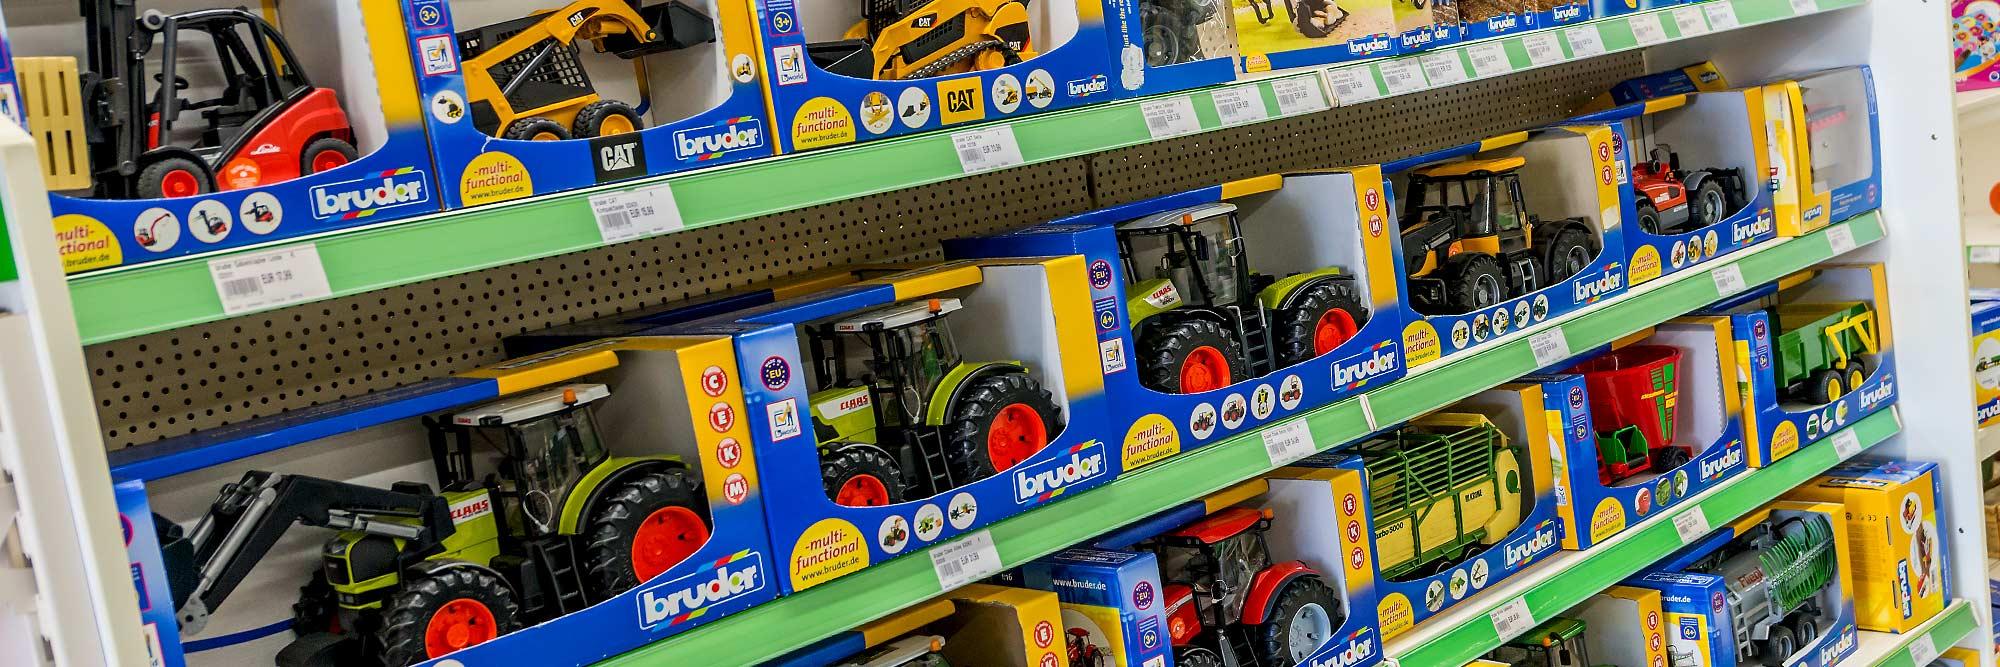 Raiffeisen Markt Ottmarsbocholt Spielzeug